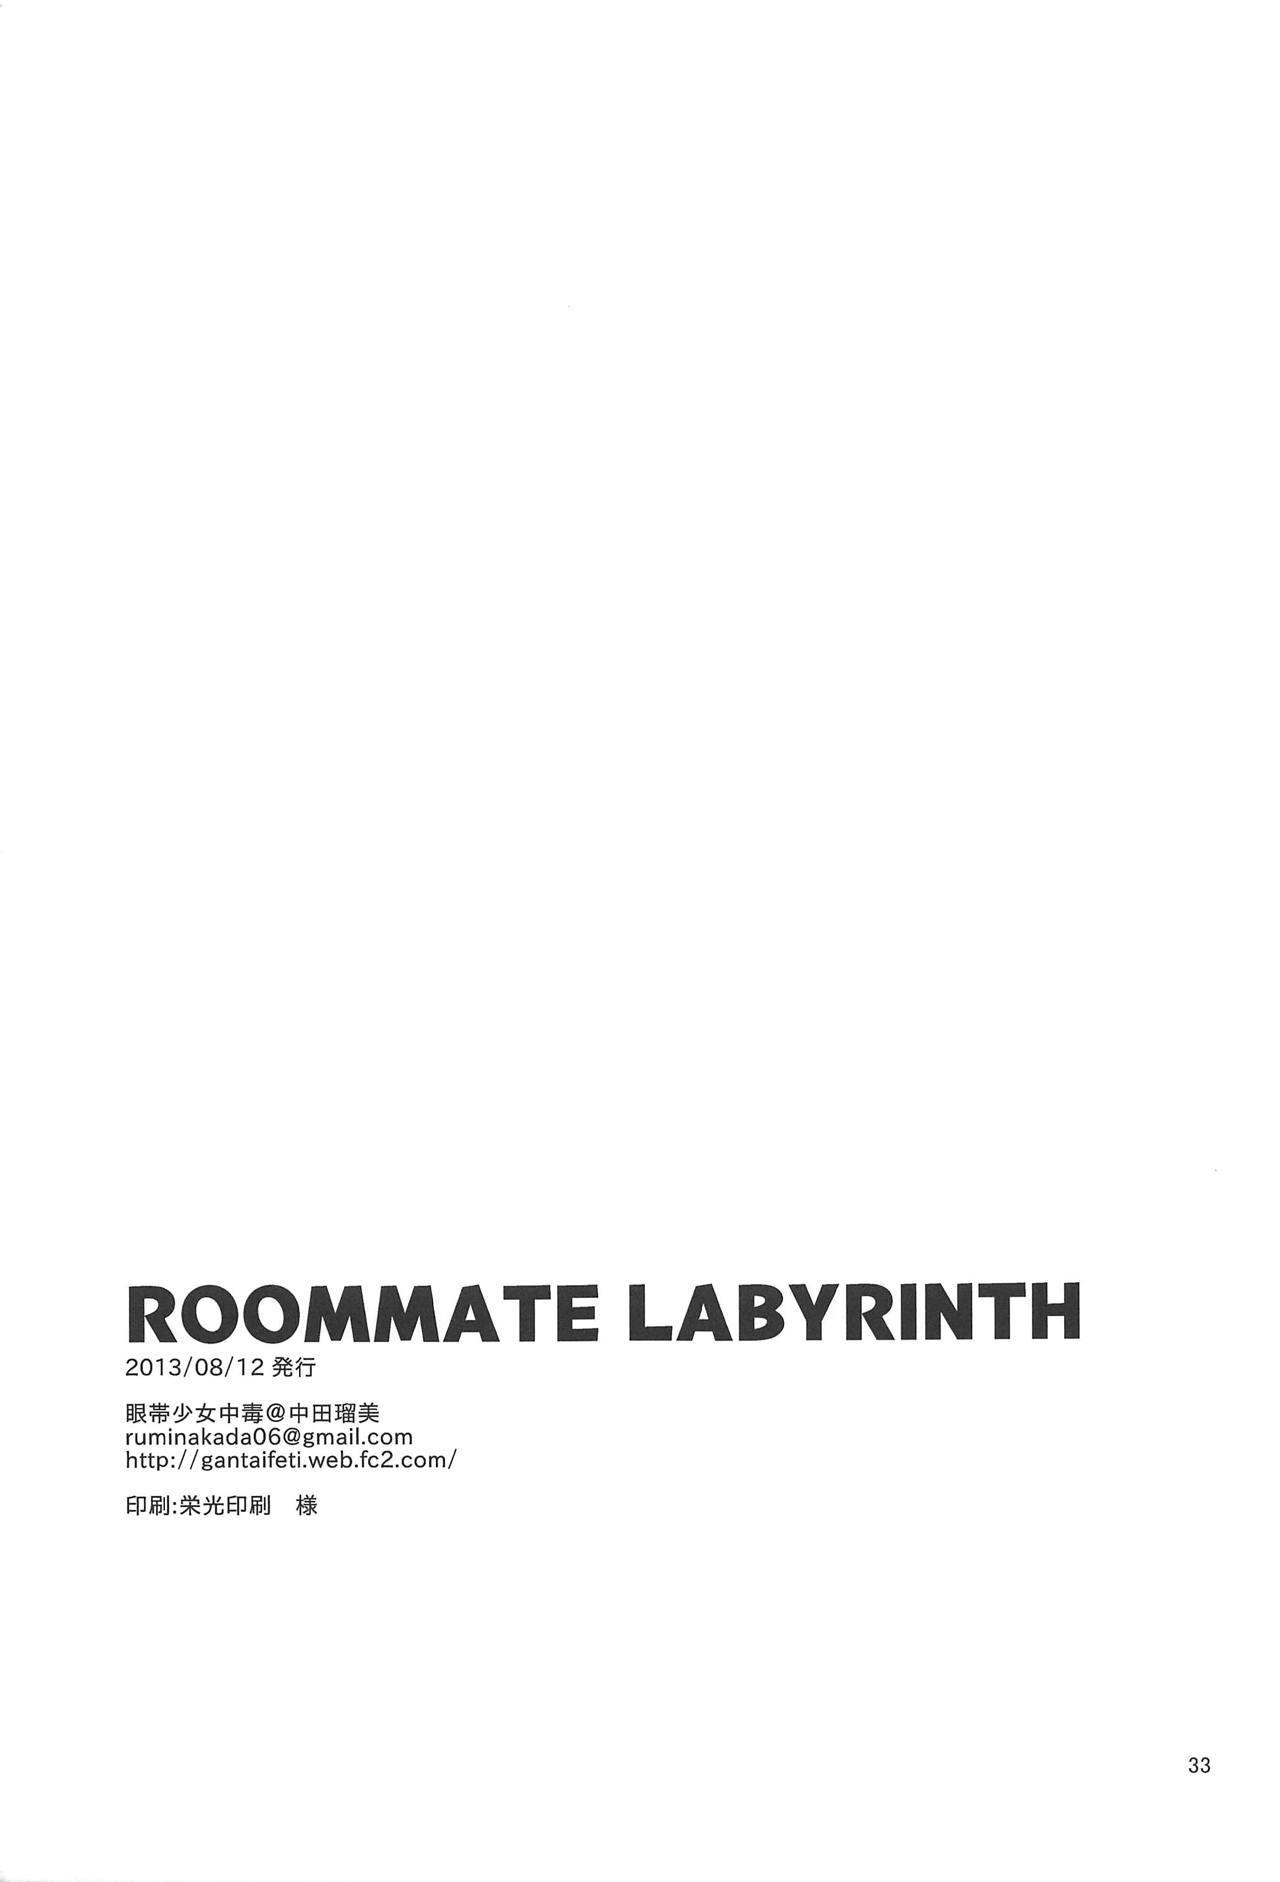 ROOMMATE LABYRINTH 31